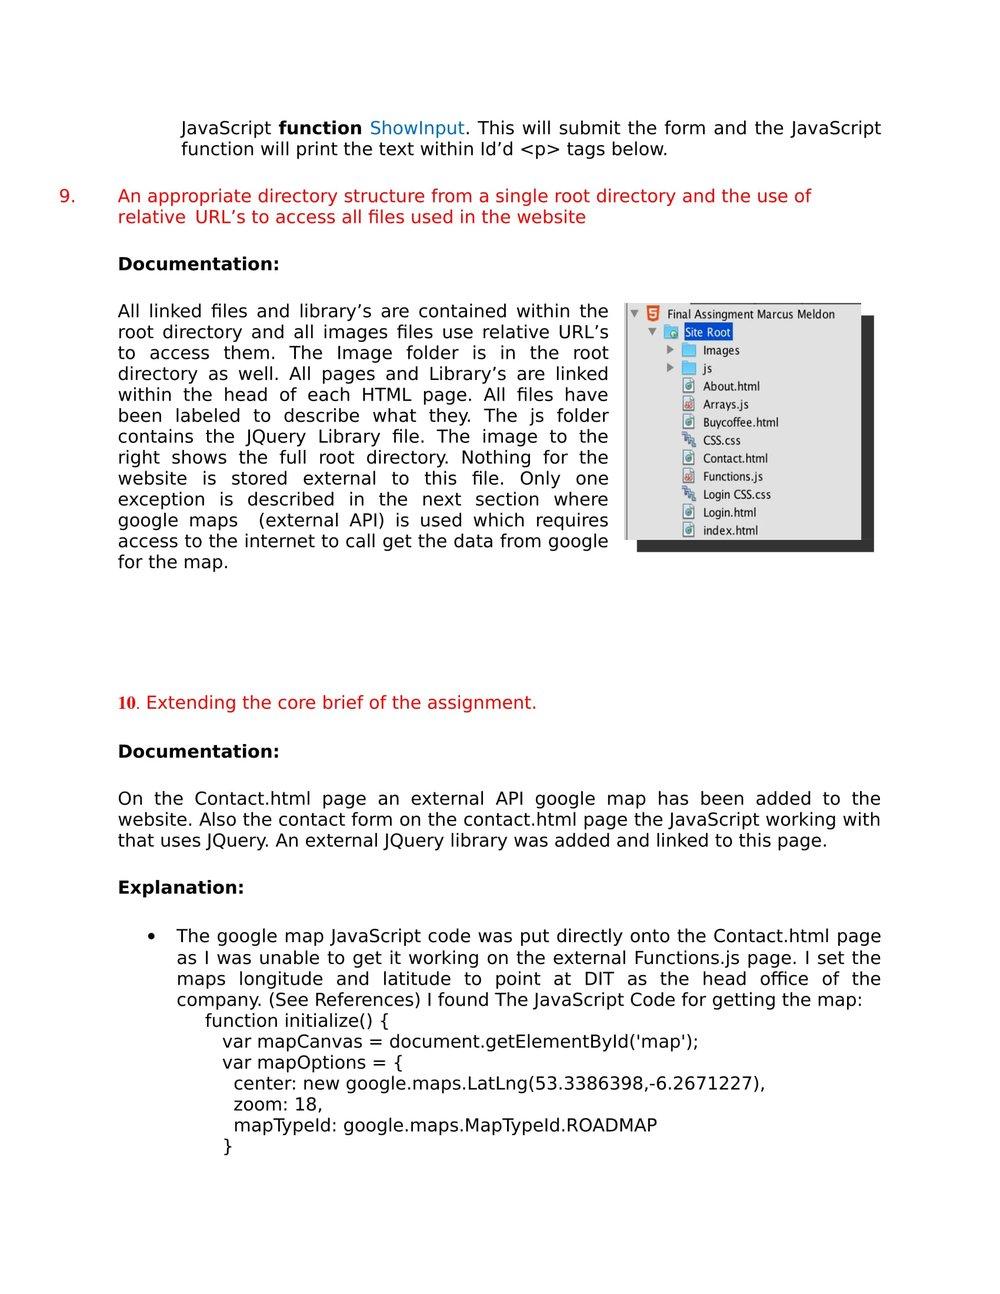 cluster analysis paper research in quantitative